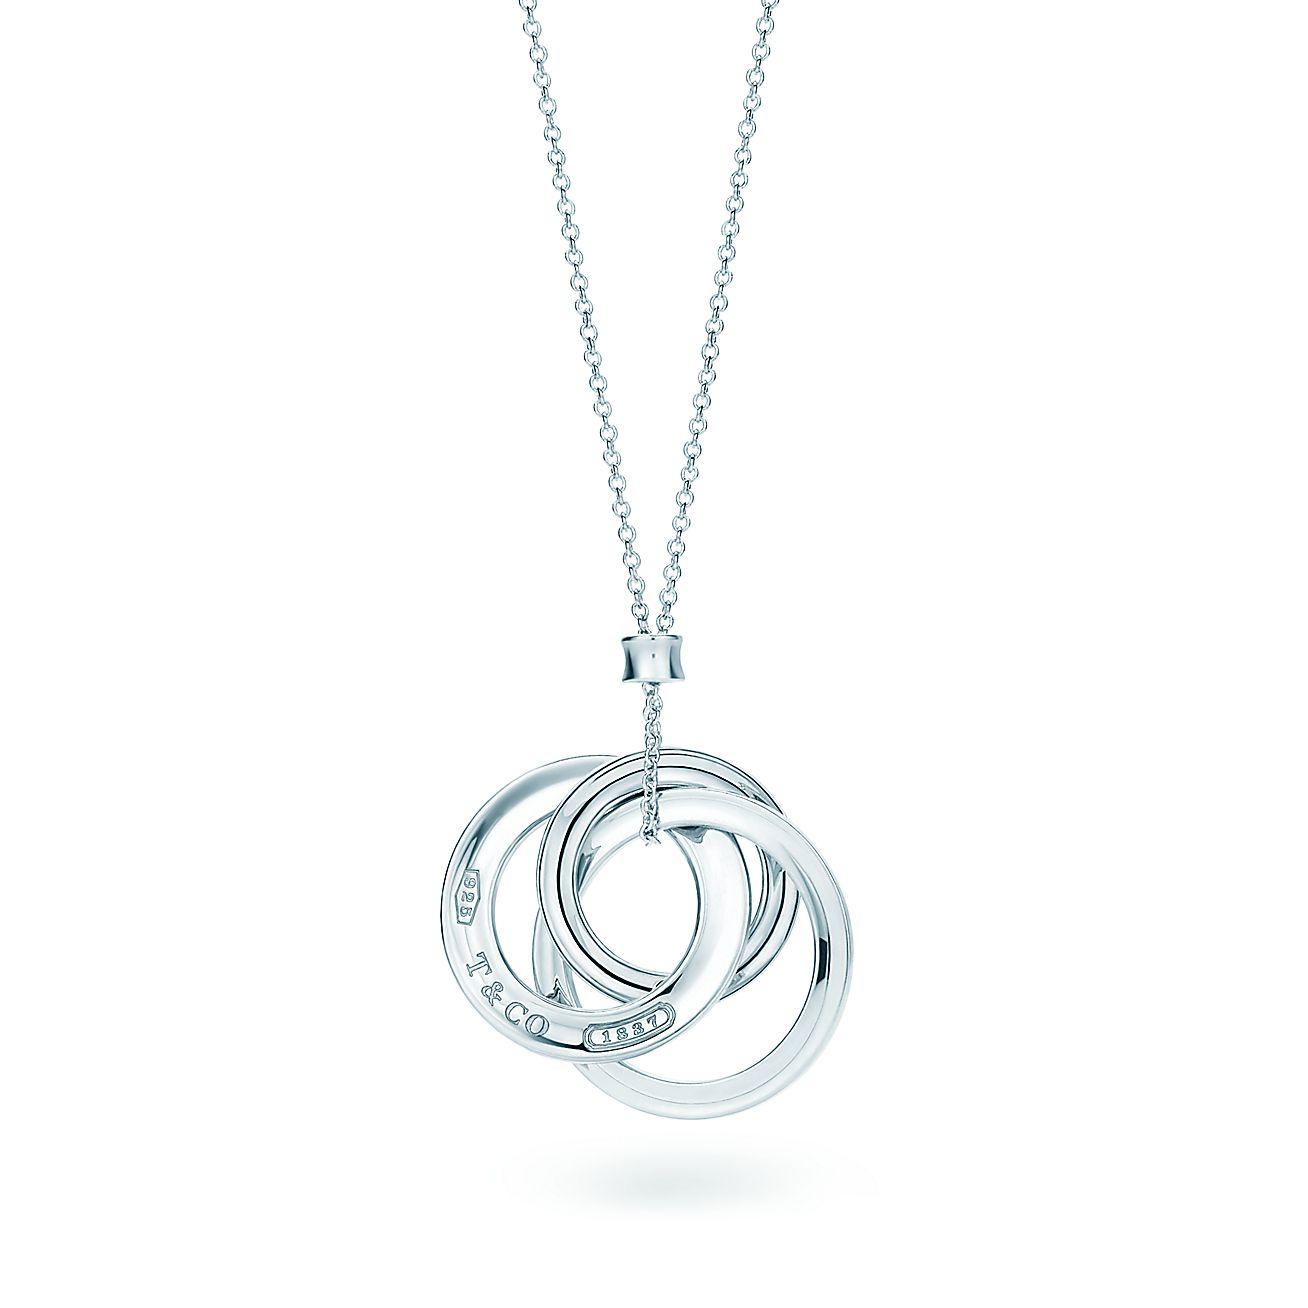 Tiffany 1837®:Interlocking Circles<br>Pendant